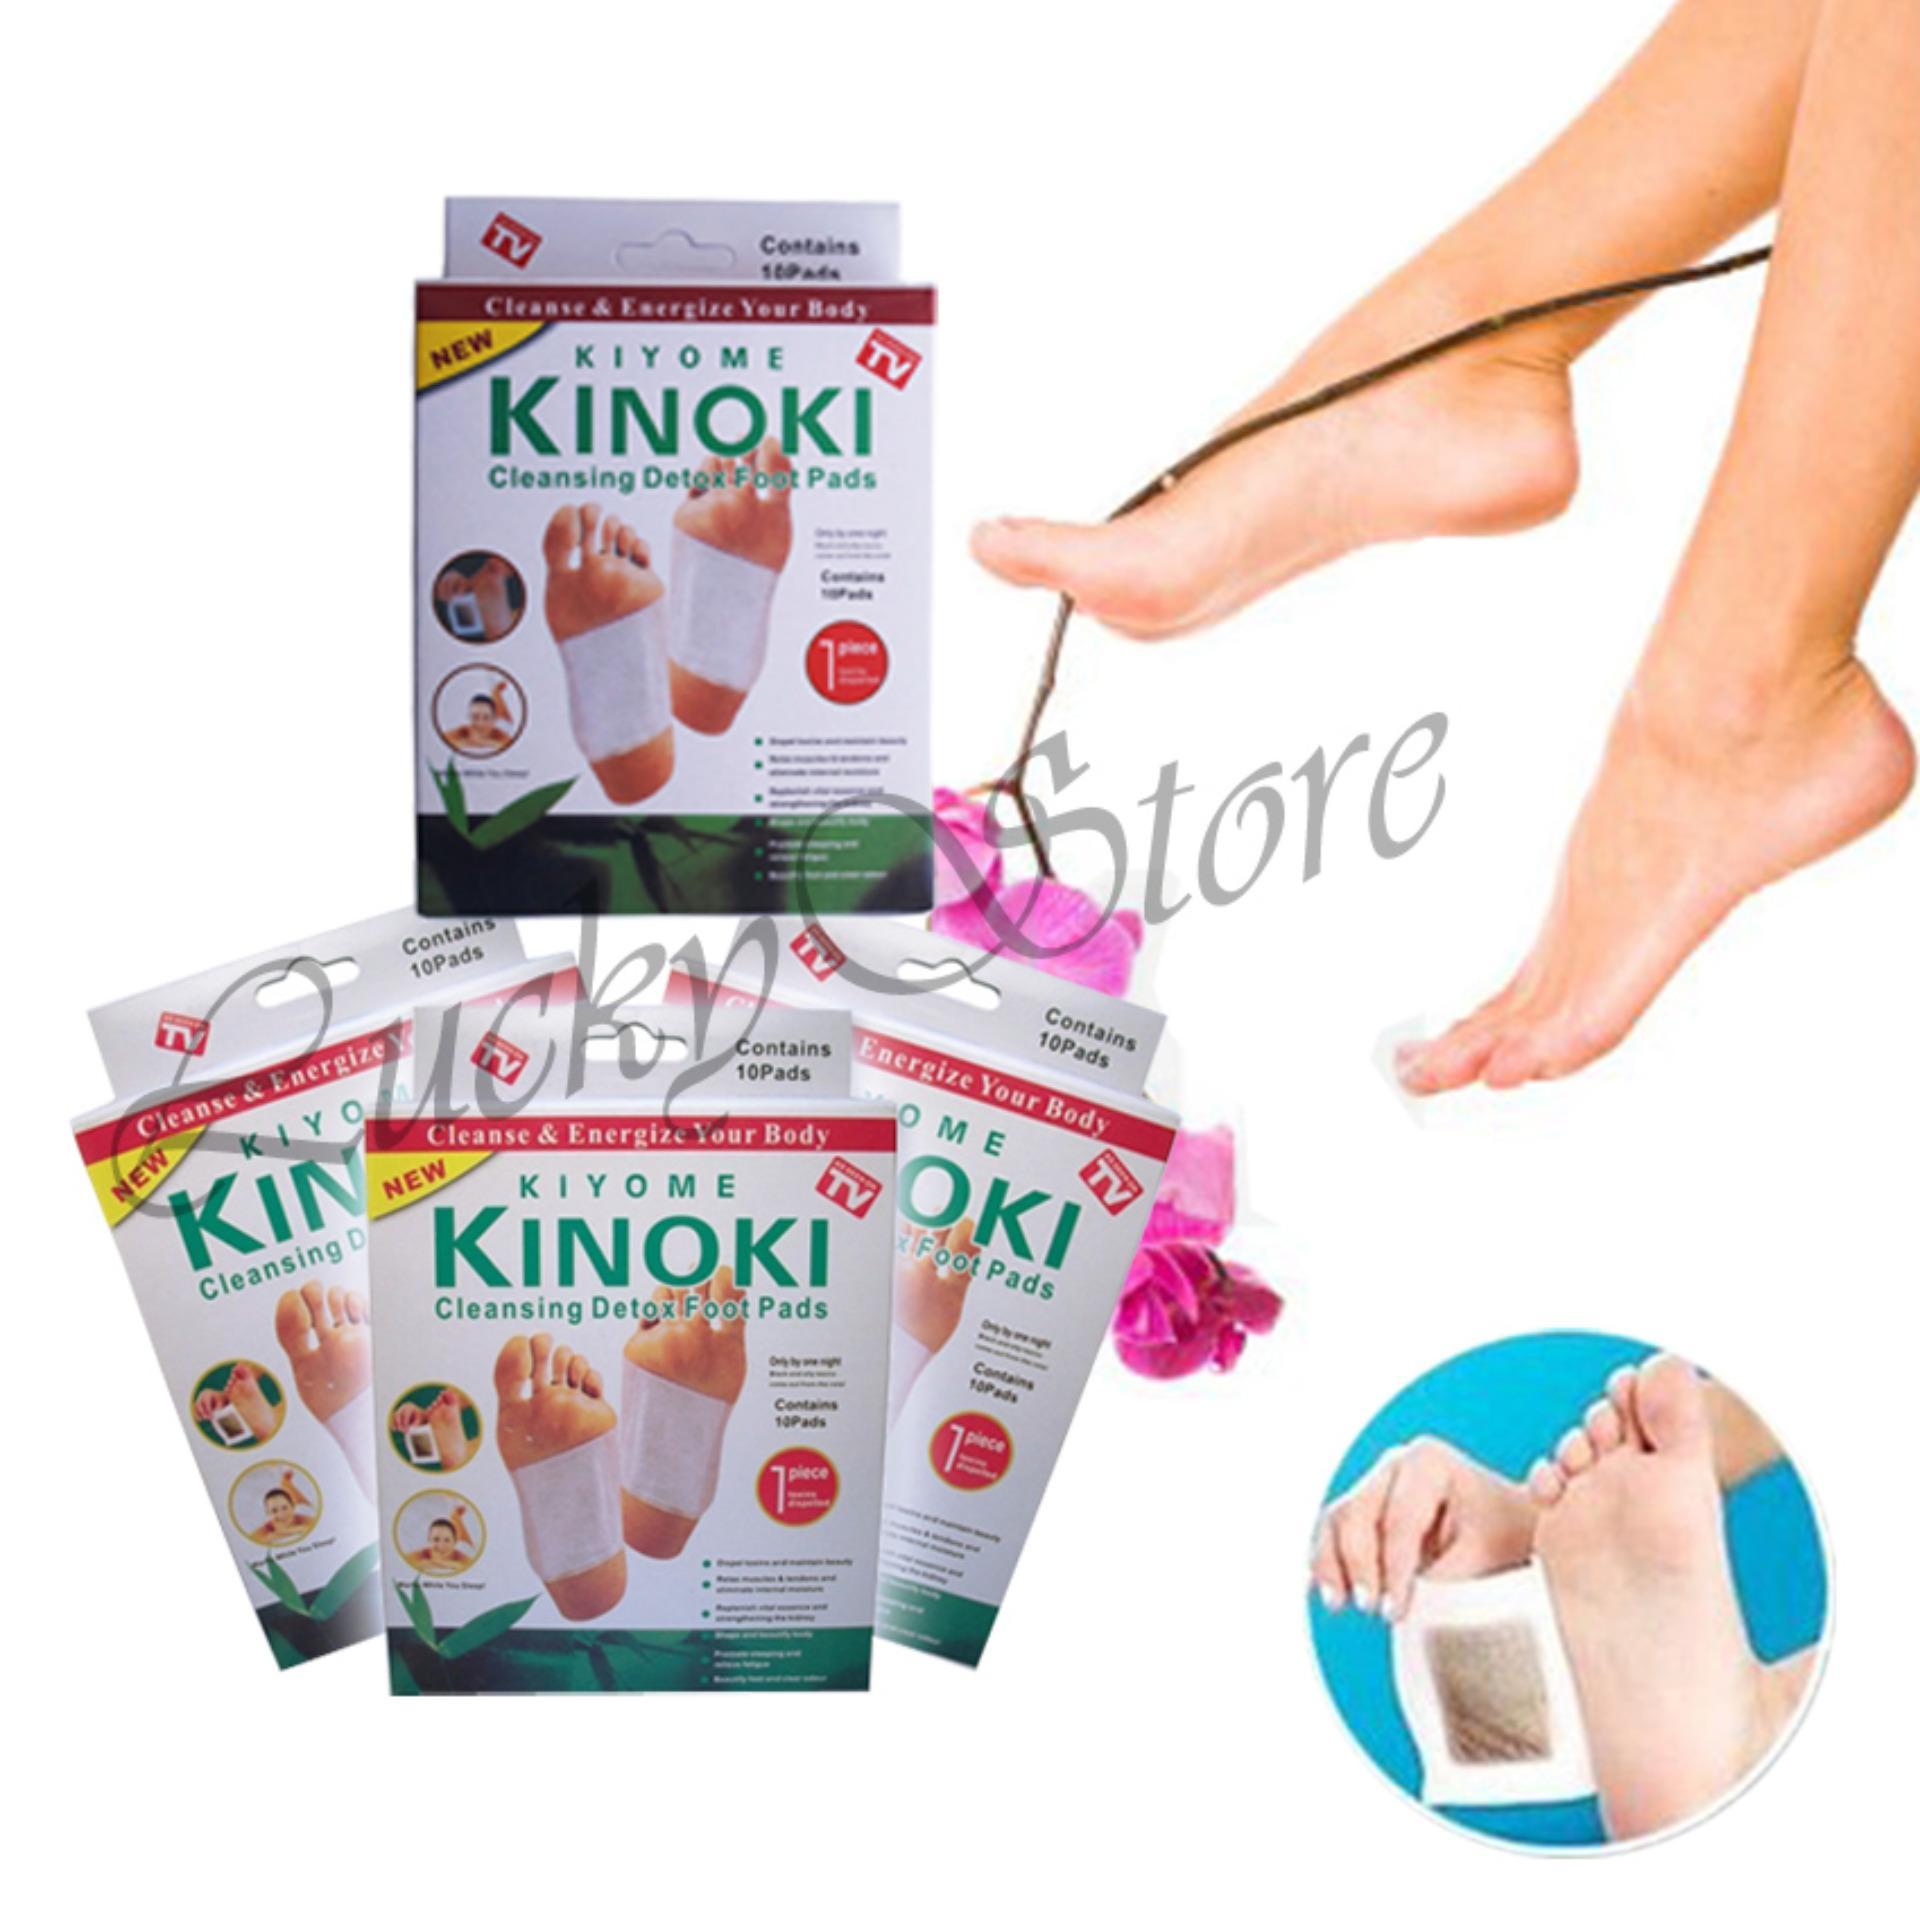 Kinoki Koyo Kaki Herbal Detox Foot Patch Gold 3 Box Isi 30pcs Per Toko Source